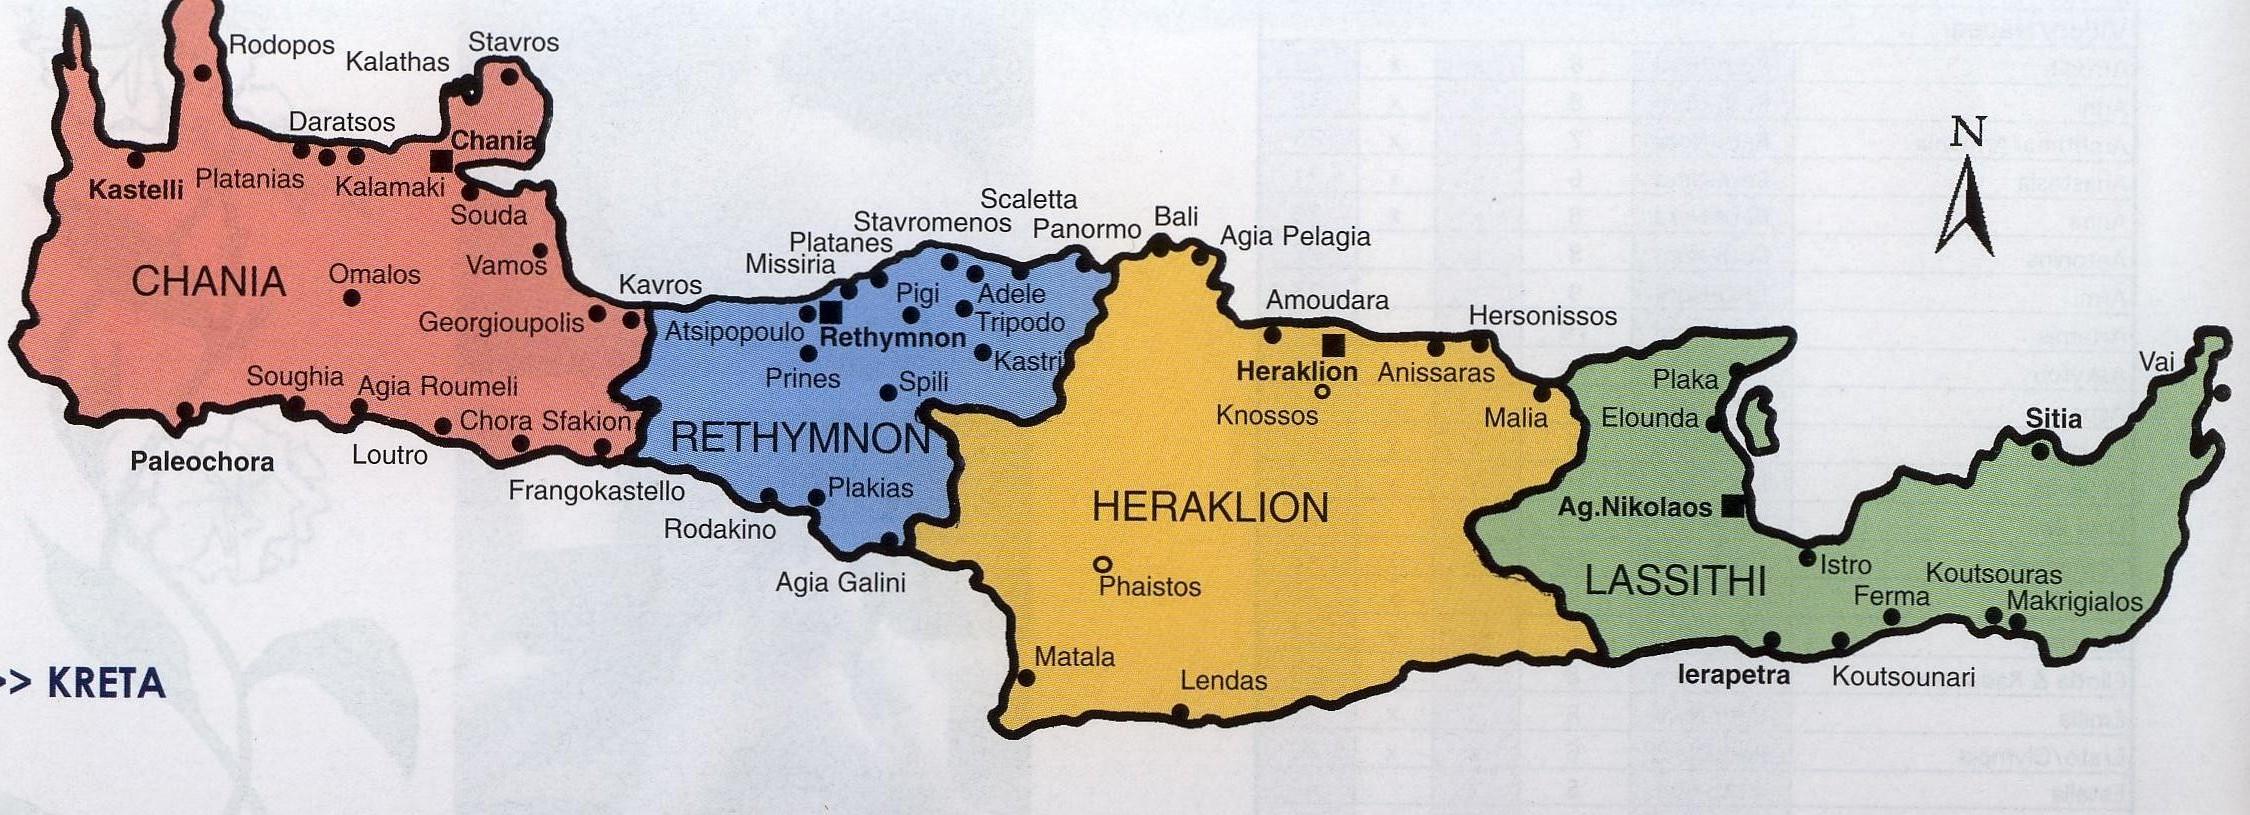 Carte Crete Stavromenos.Bezirke Kreta Reisefuhrer Kreta Abc Ihr Kreta Guide